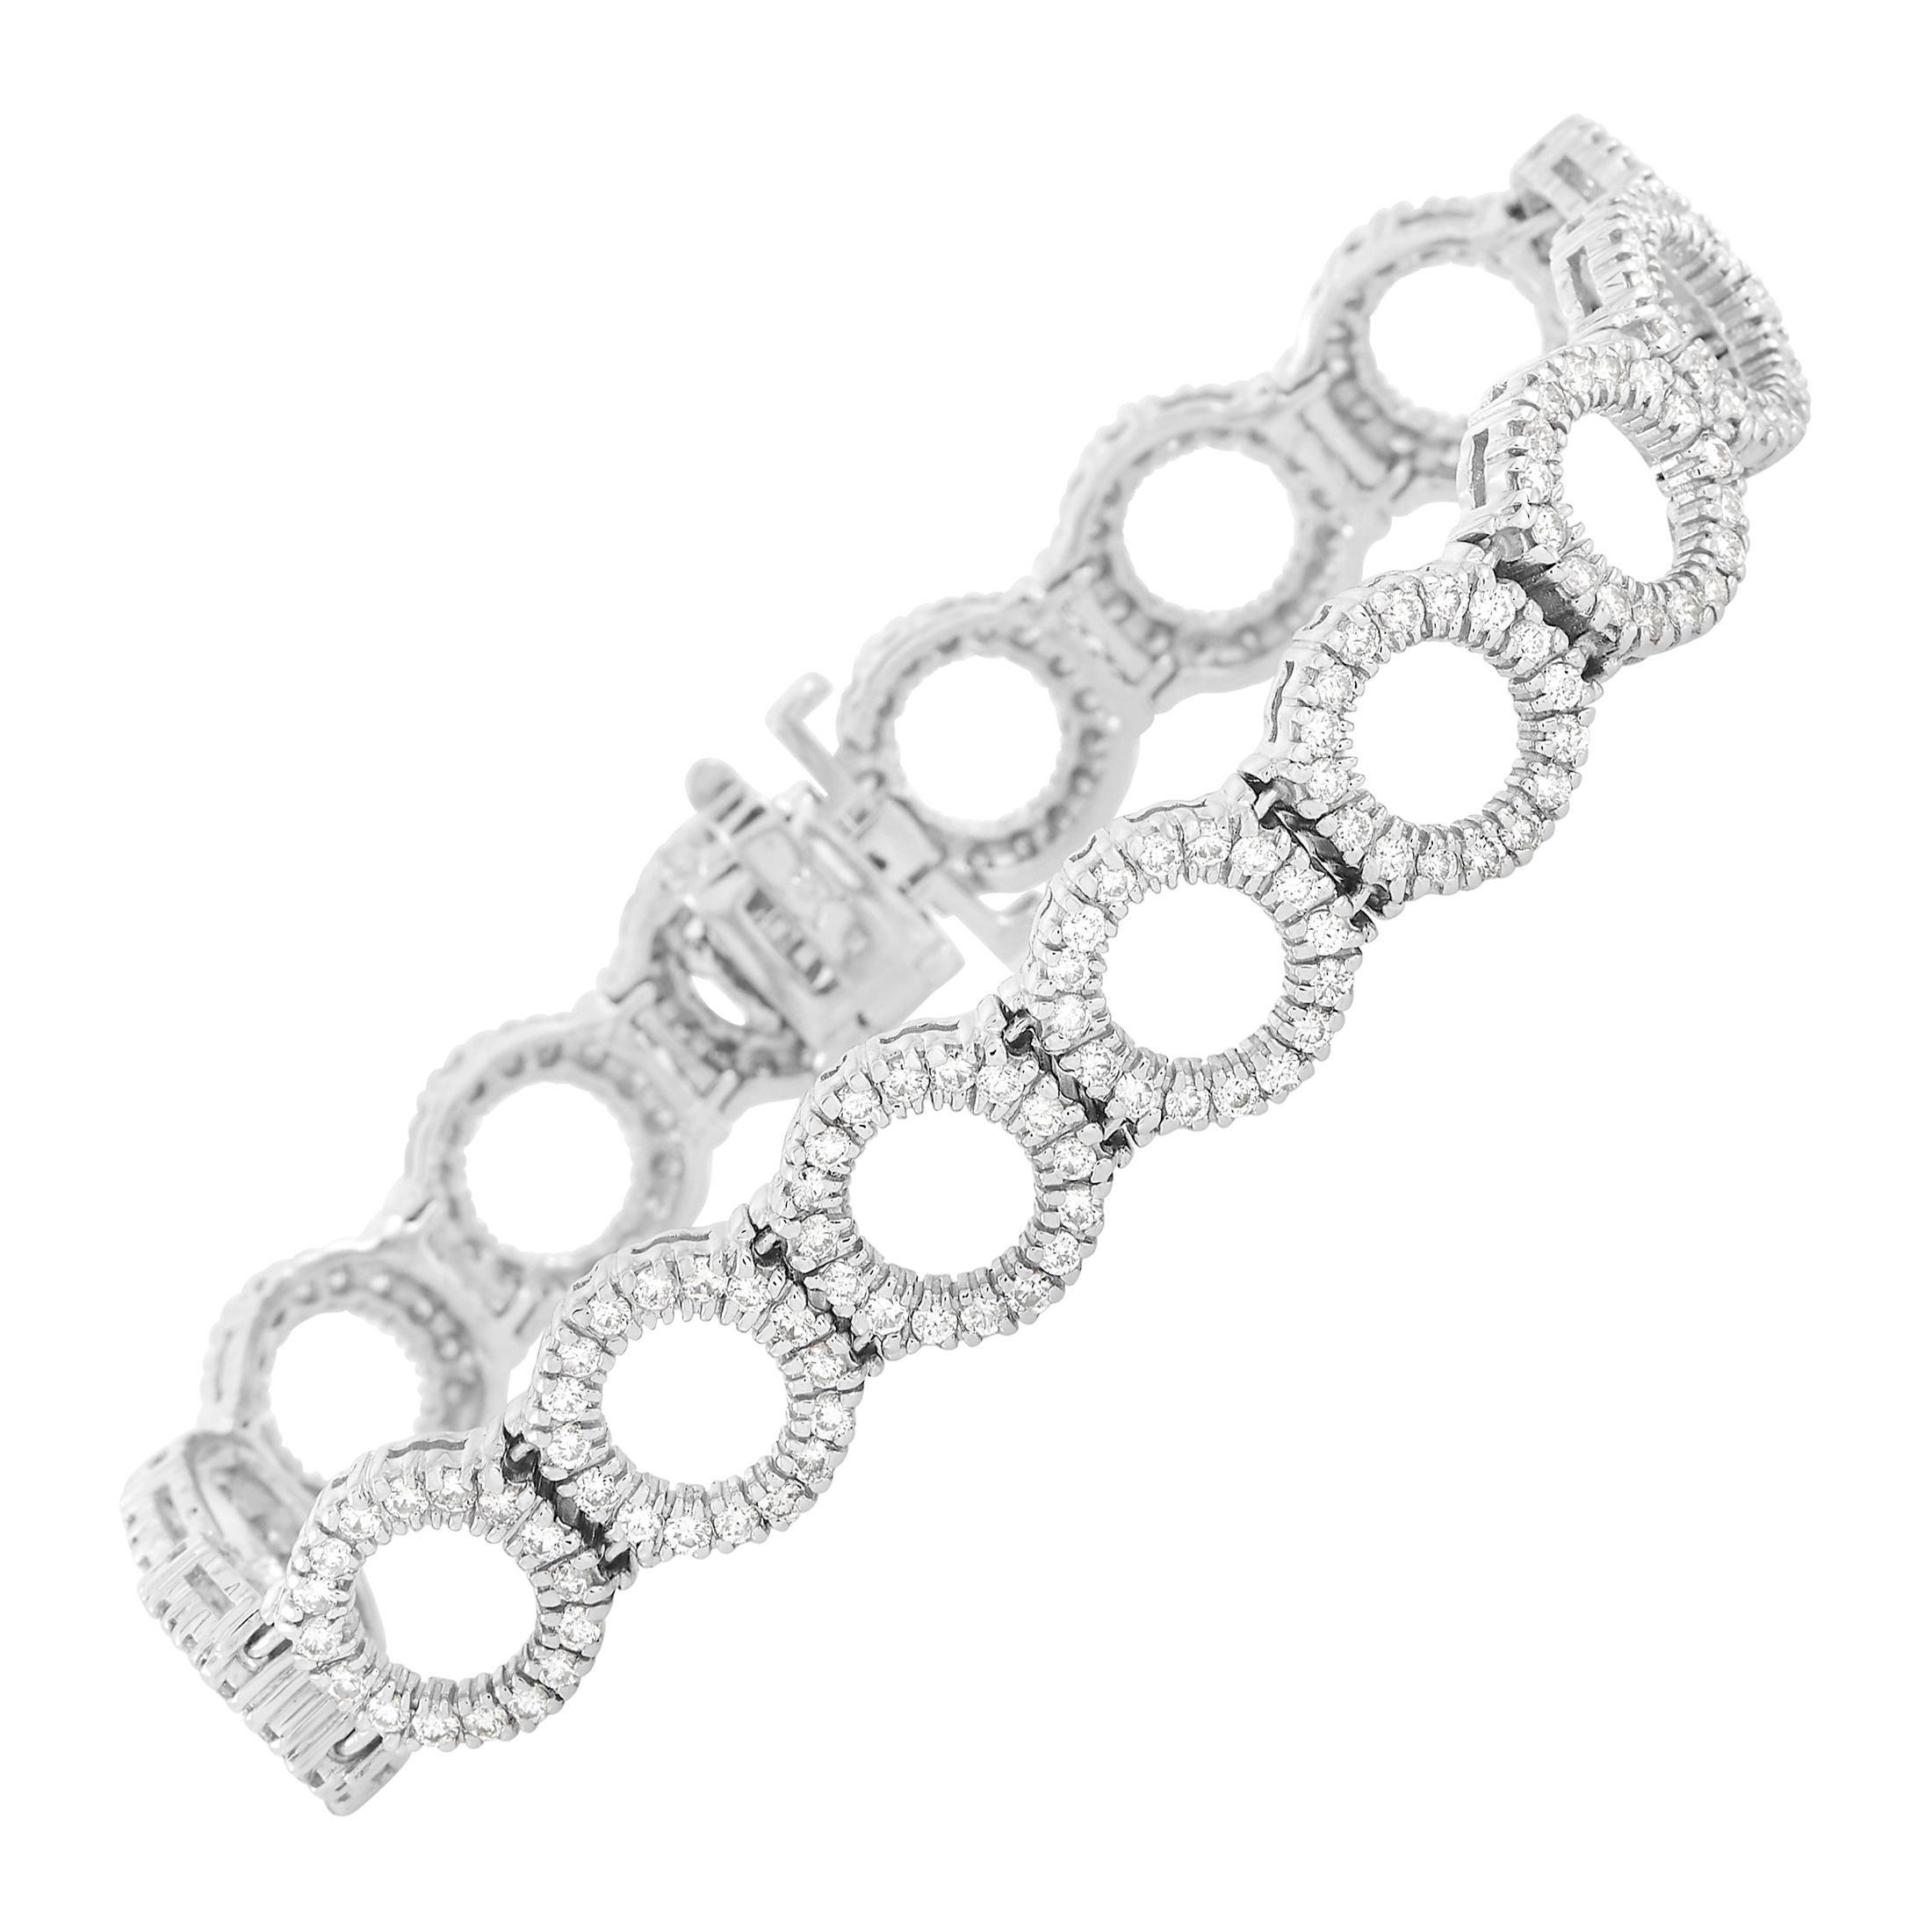 LB Exclusive 18k White Gold 4 Ct Diamond Link Bracelet